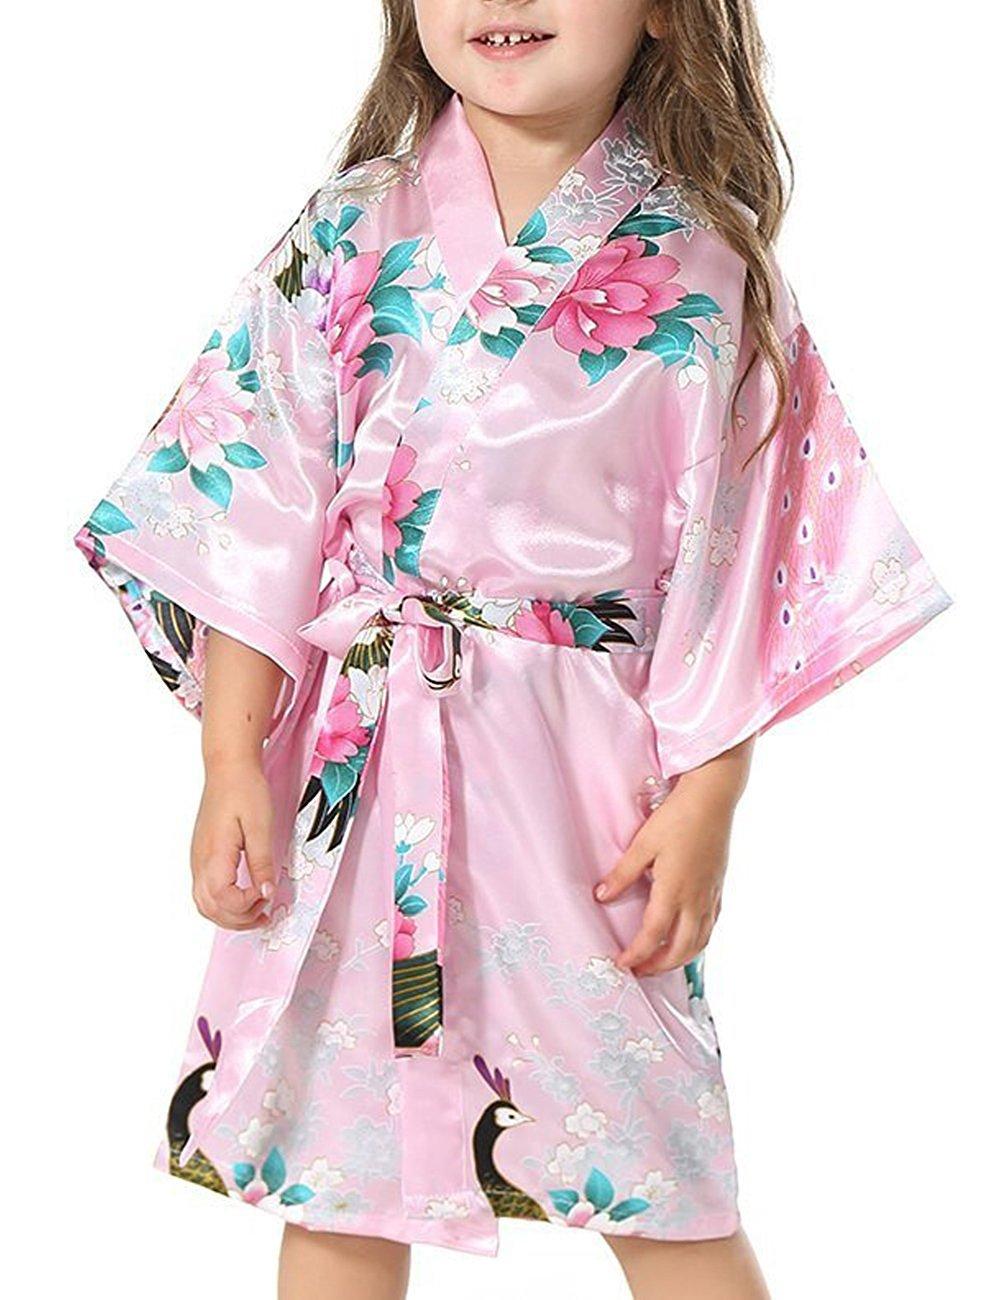 Yidarton Girls Peacock Satin Kimono Robe Fashion Bathrobe Nightgown Pink 6